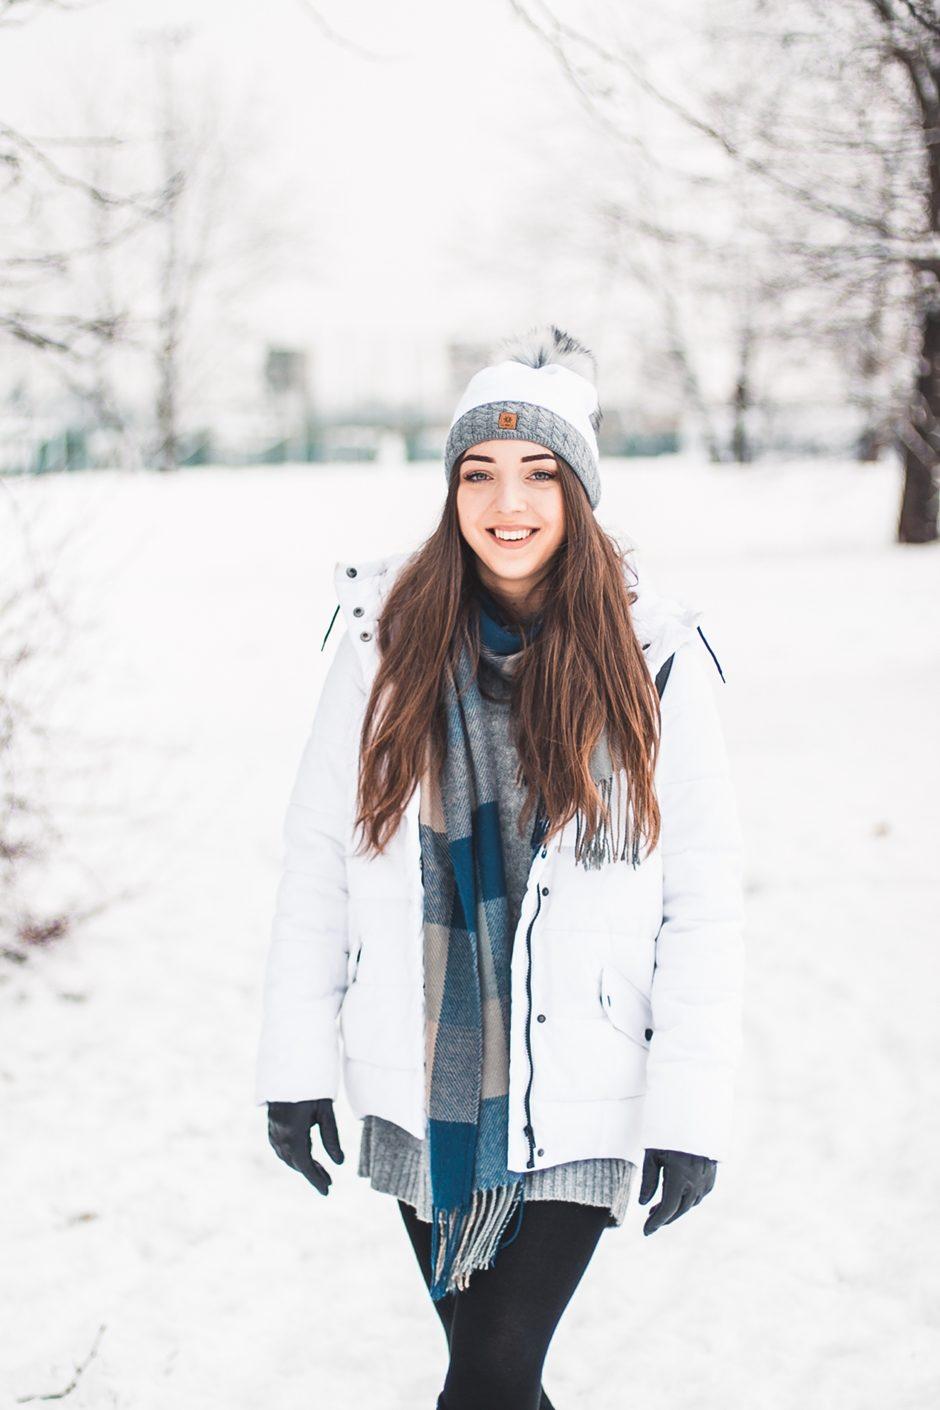 Biała kurtka puchowa na zimę